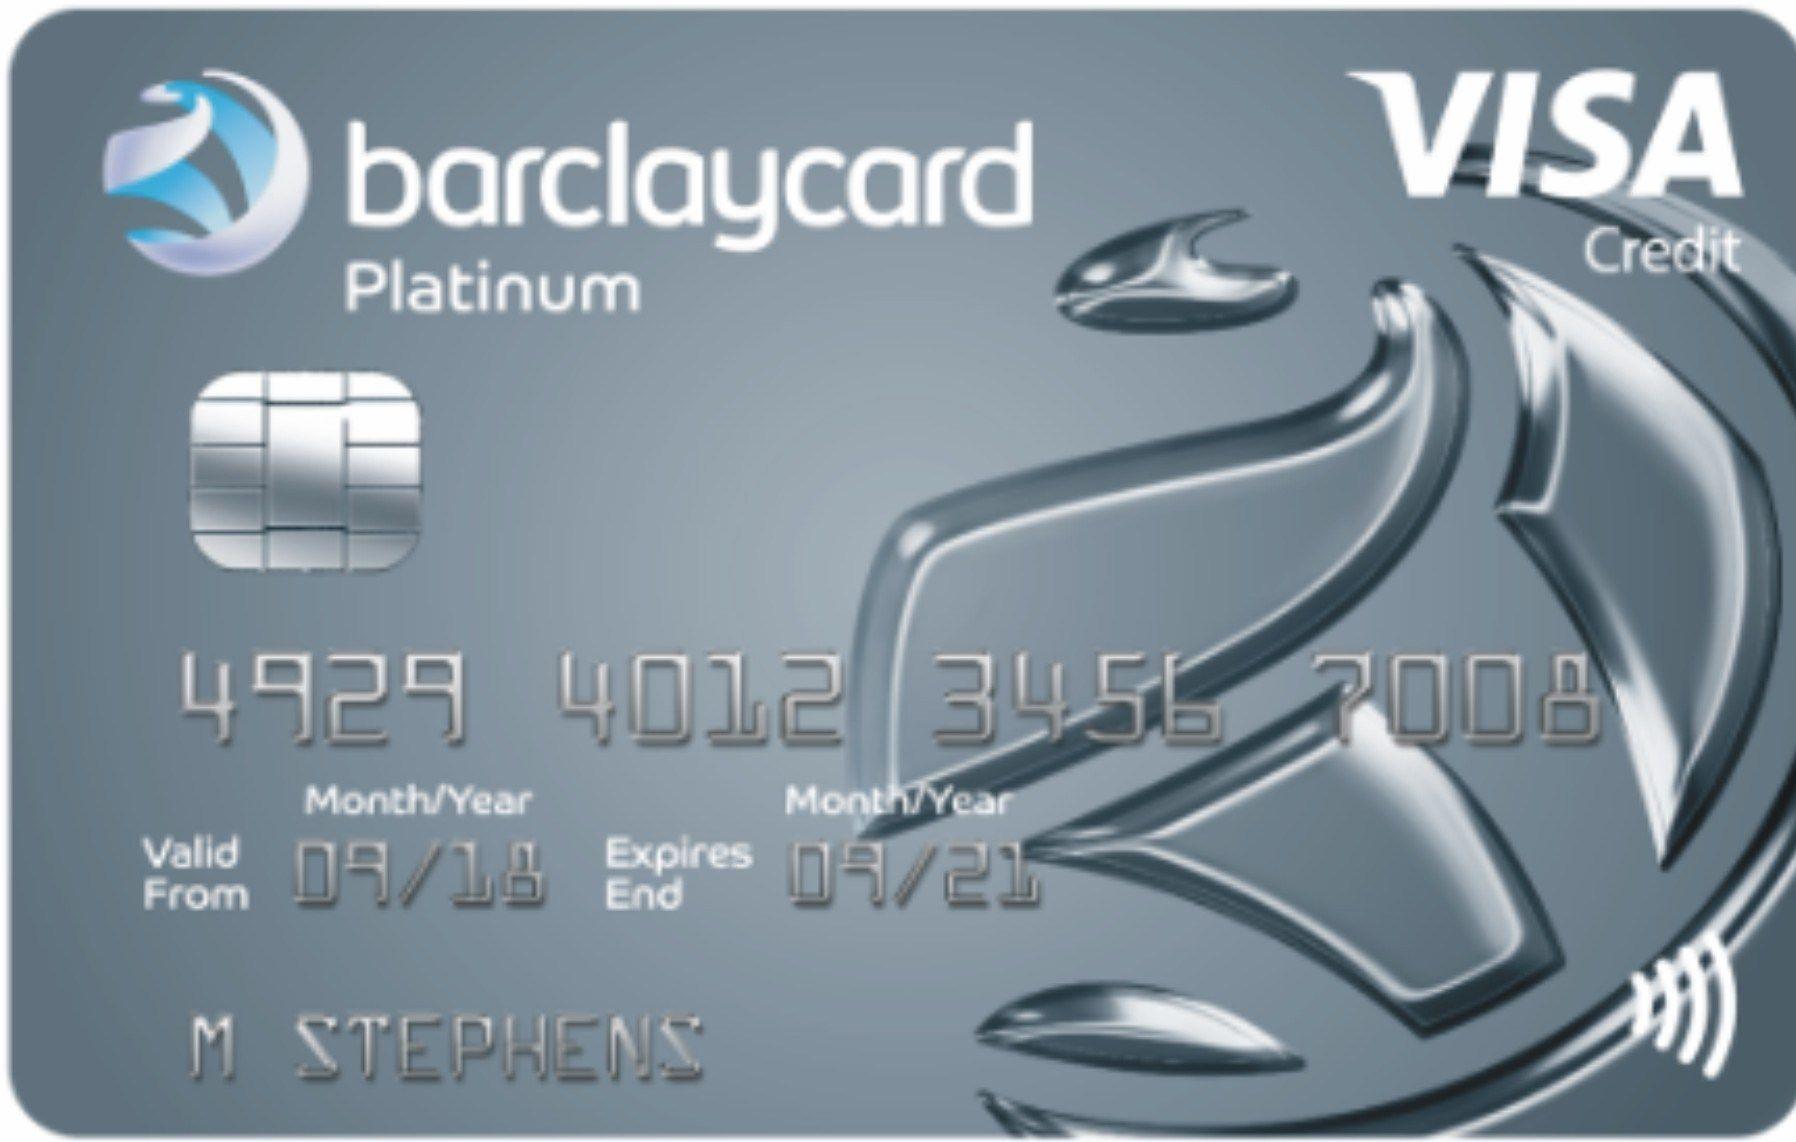 Barclaycard platinum credit card interest rates